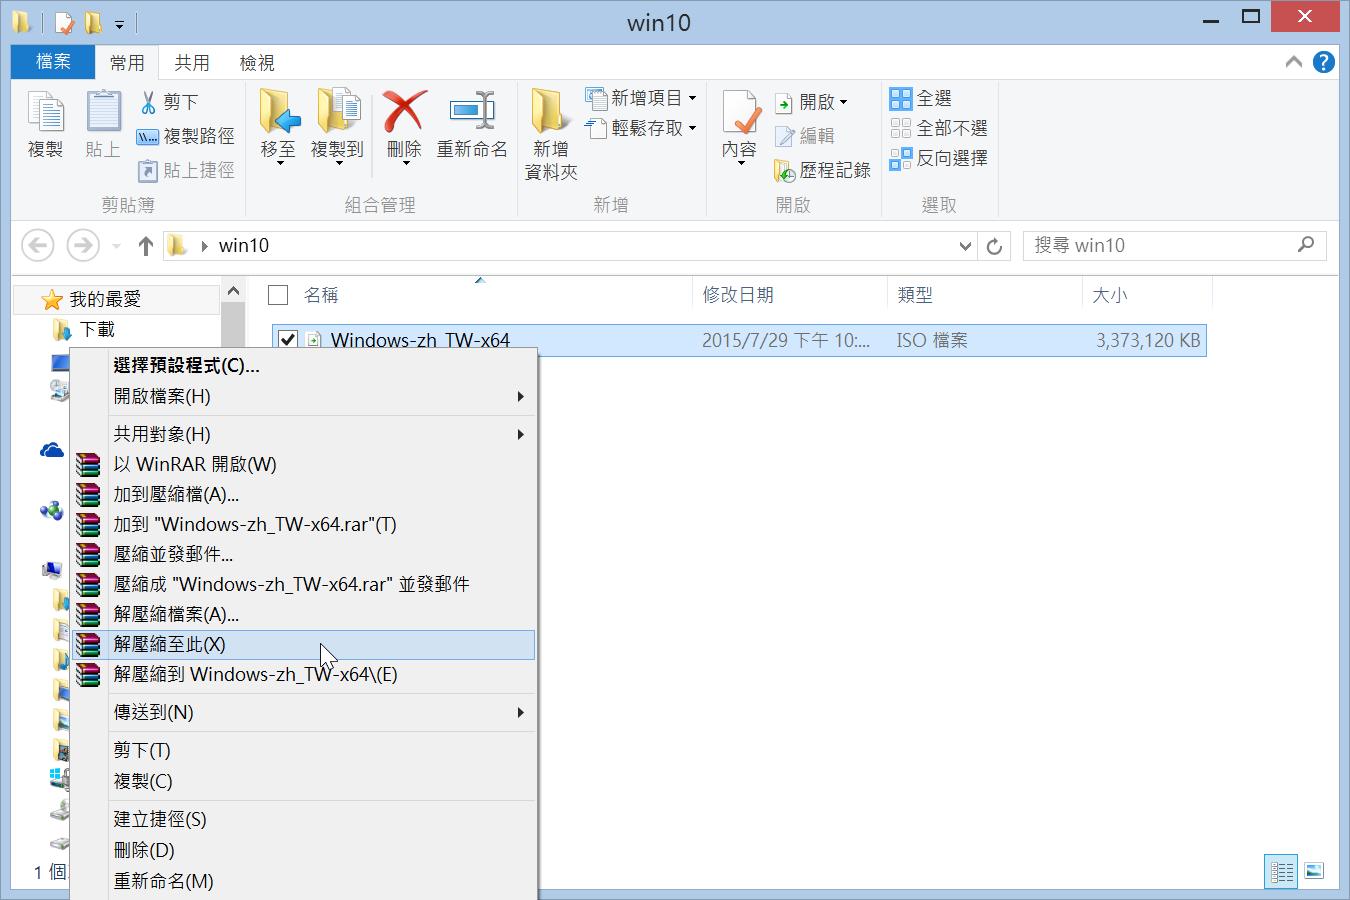 Image%2B001 - [實測] Win7/Win8/Win8.1免費升級至Win10,超簡單免用USB、光碟機!